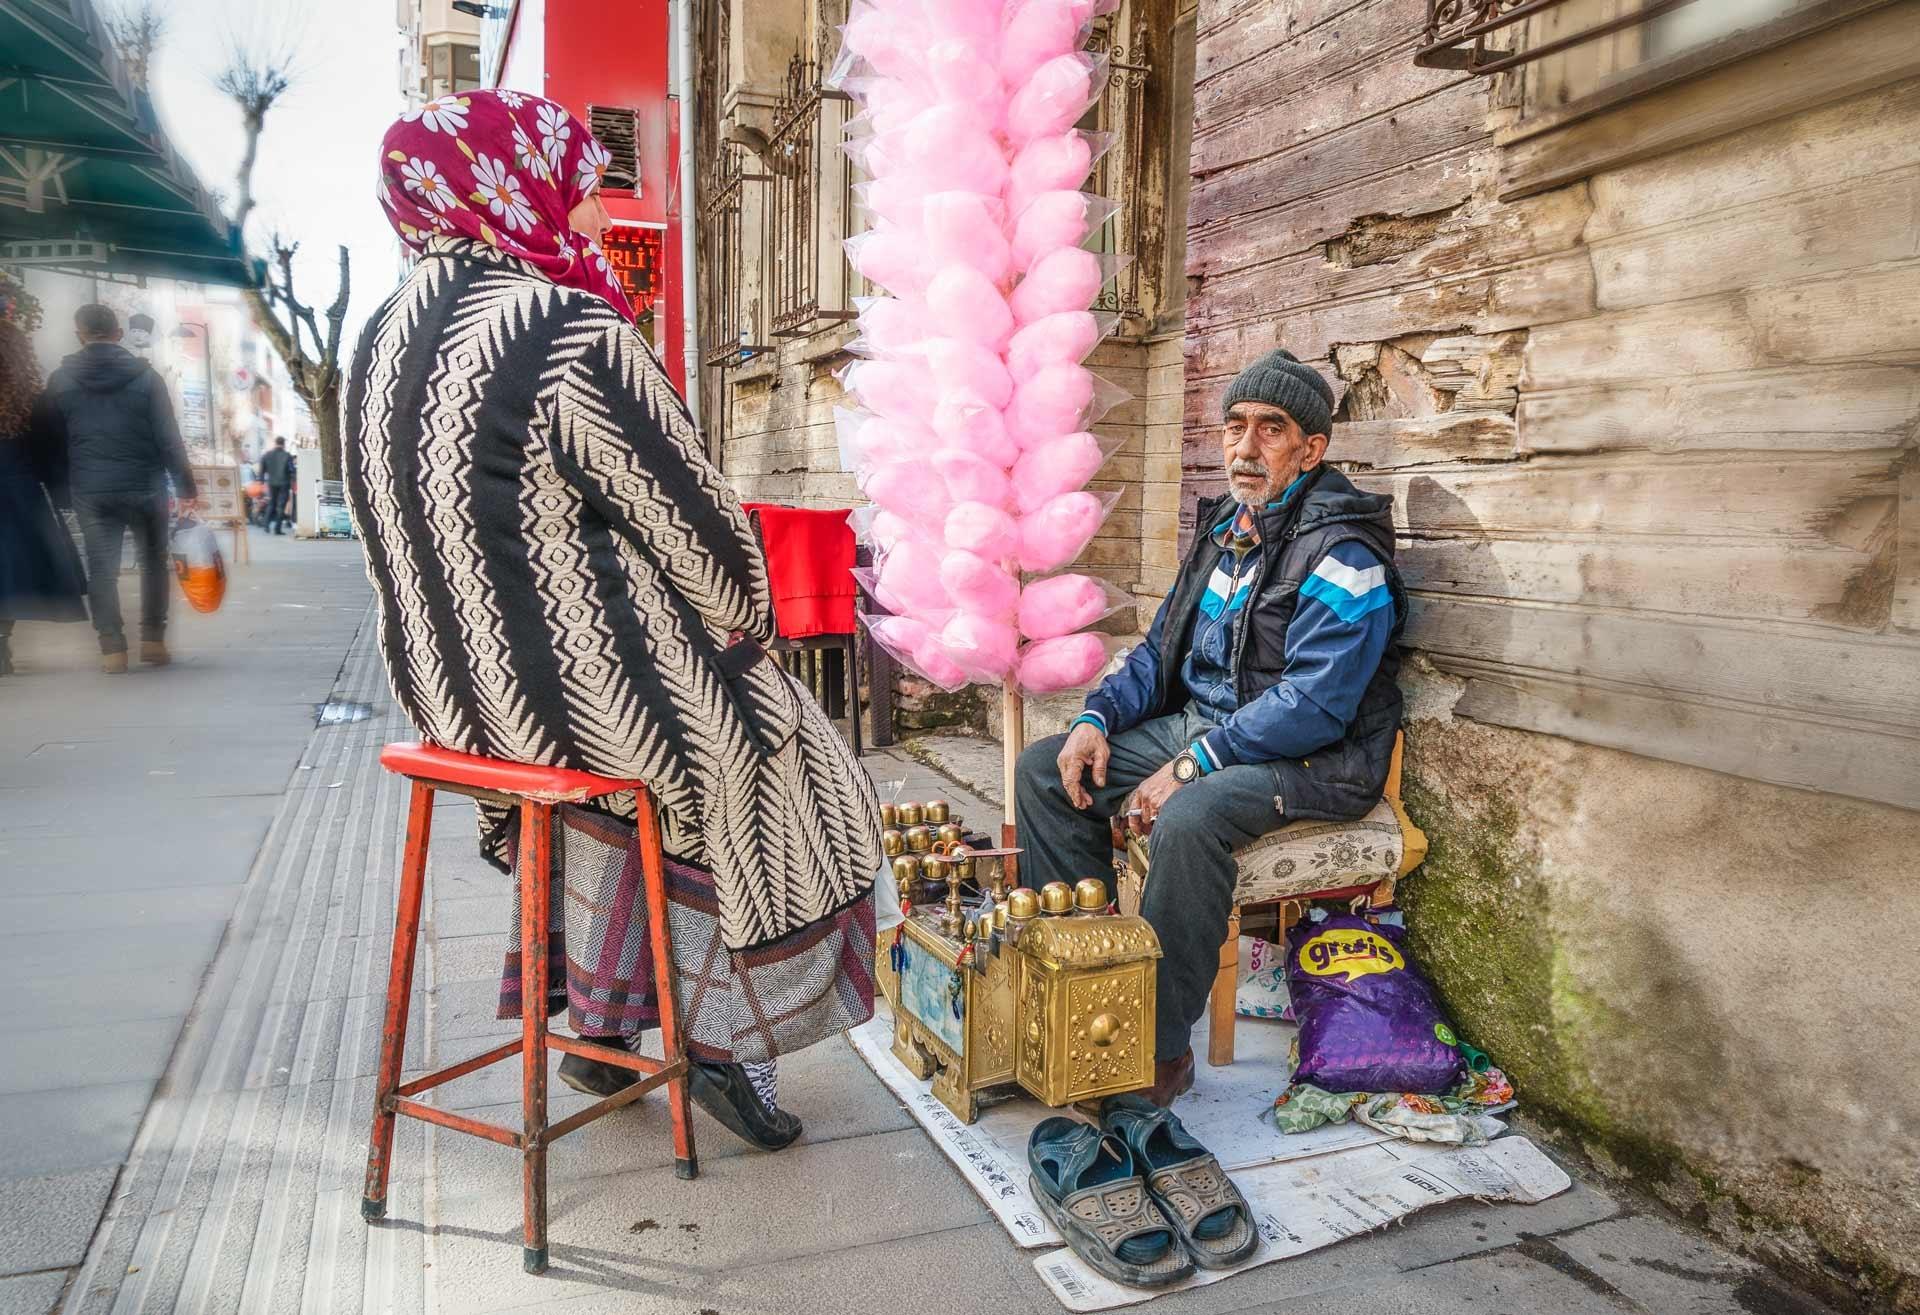 On the street - bootblack by Venelin Todorov